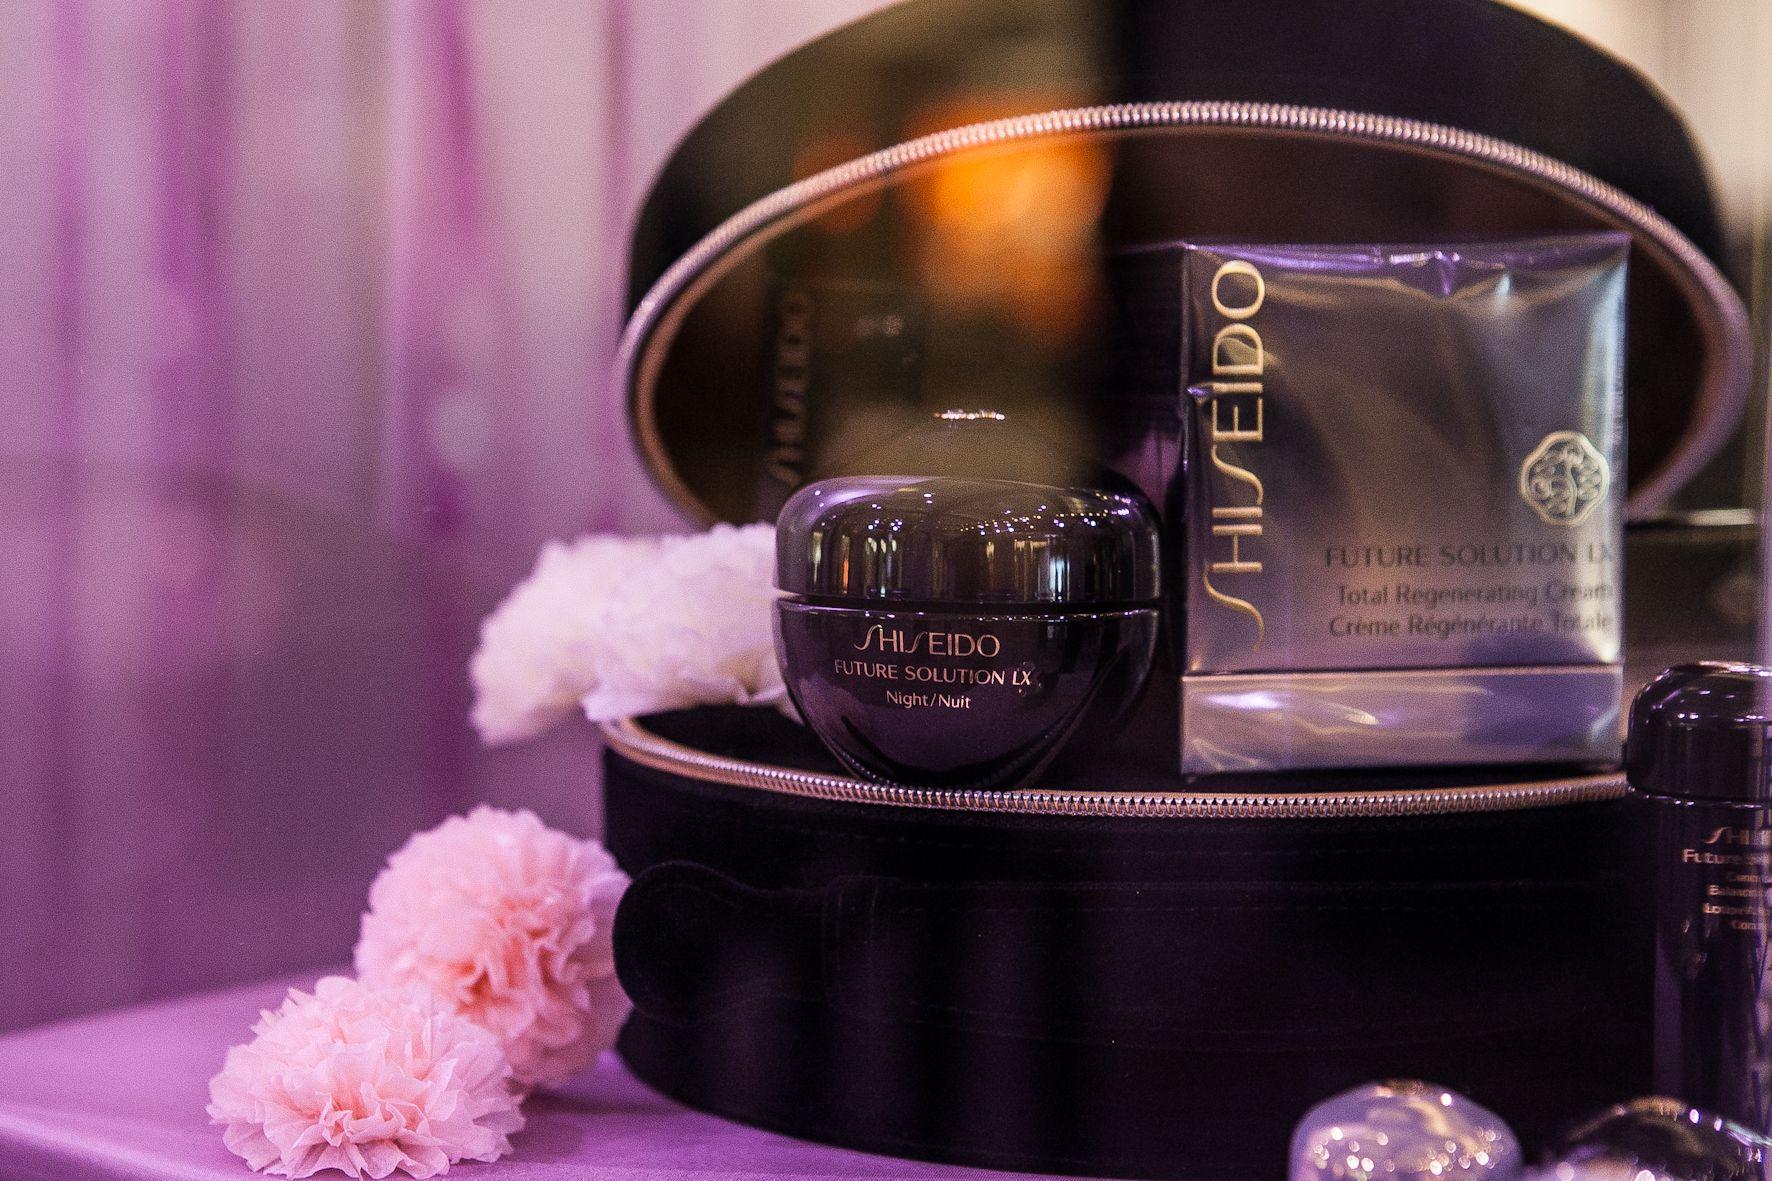 Präsentation des #Shiseido Future Solution LX Ultimate Regenerating Serum bei der Eröffnung der KaDeWe Beauty World  im Herbst 2012.